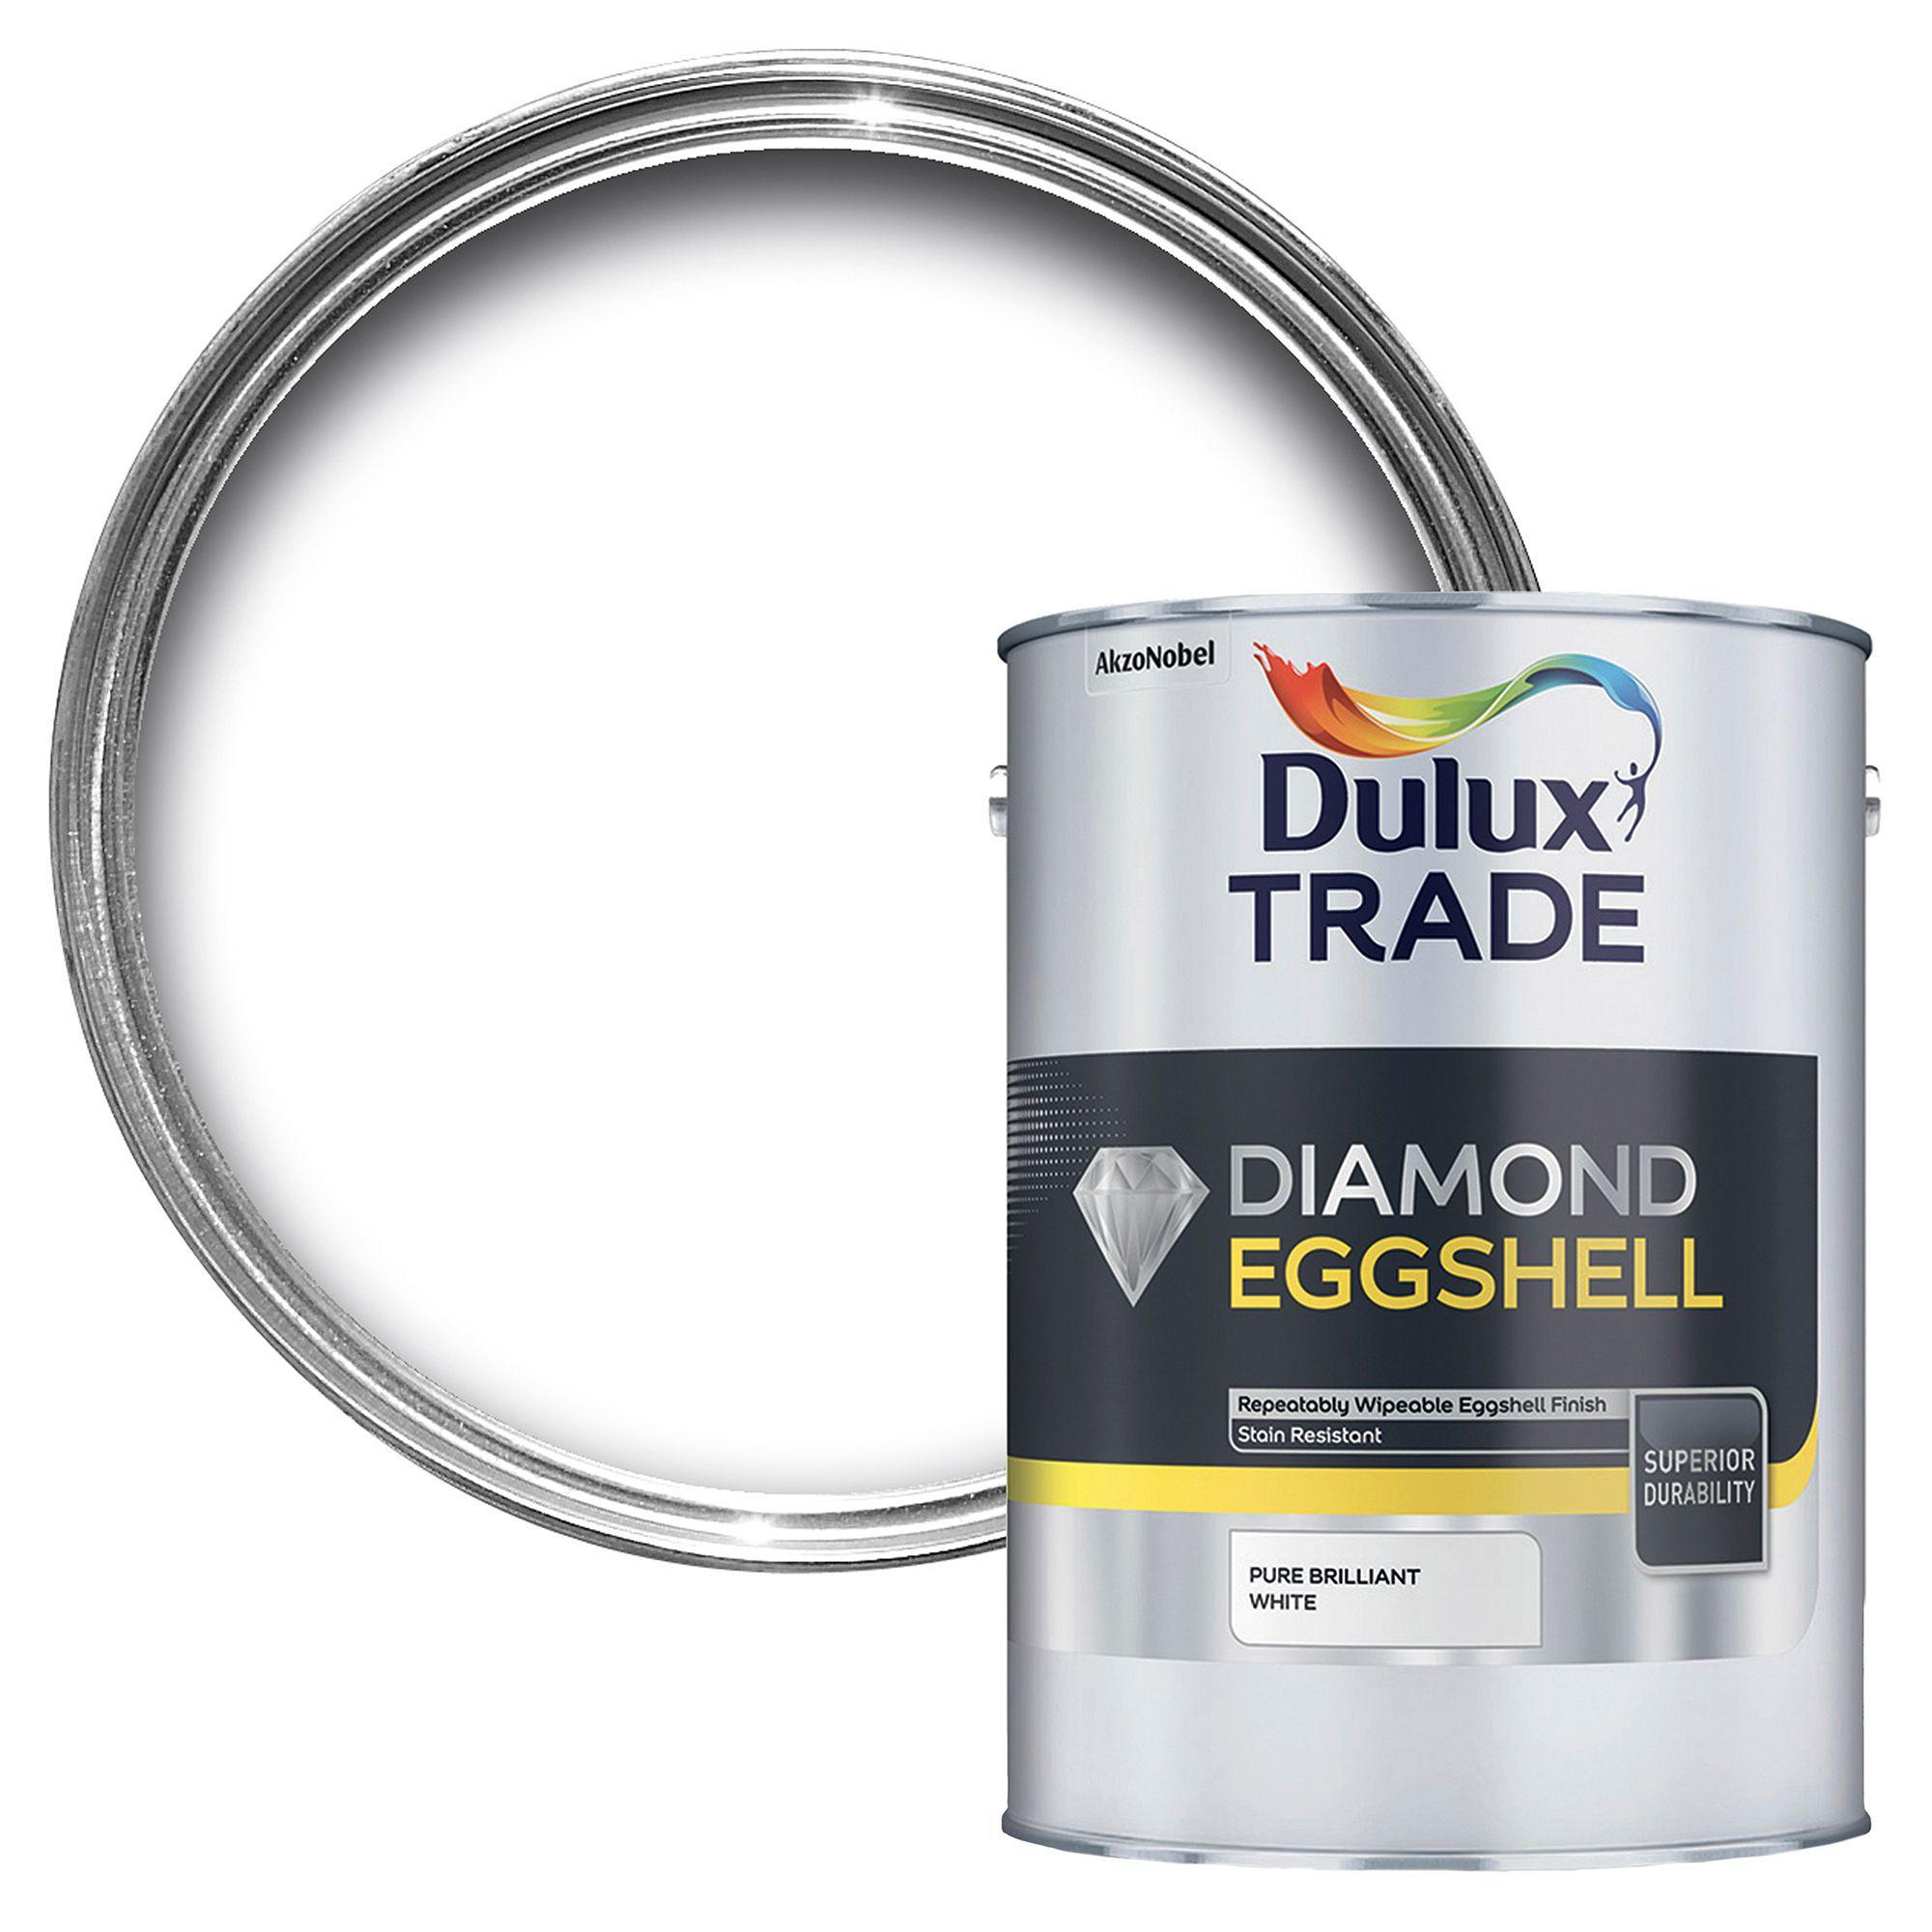 Dulux Trade Interior Brilliant White Eggshell Wood Metal Paint 2 5l Departments Diy At B Q